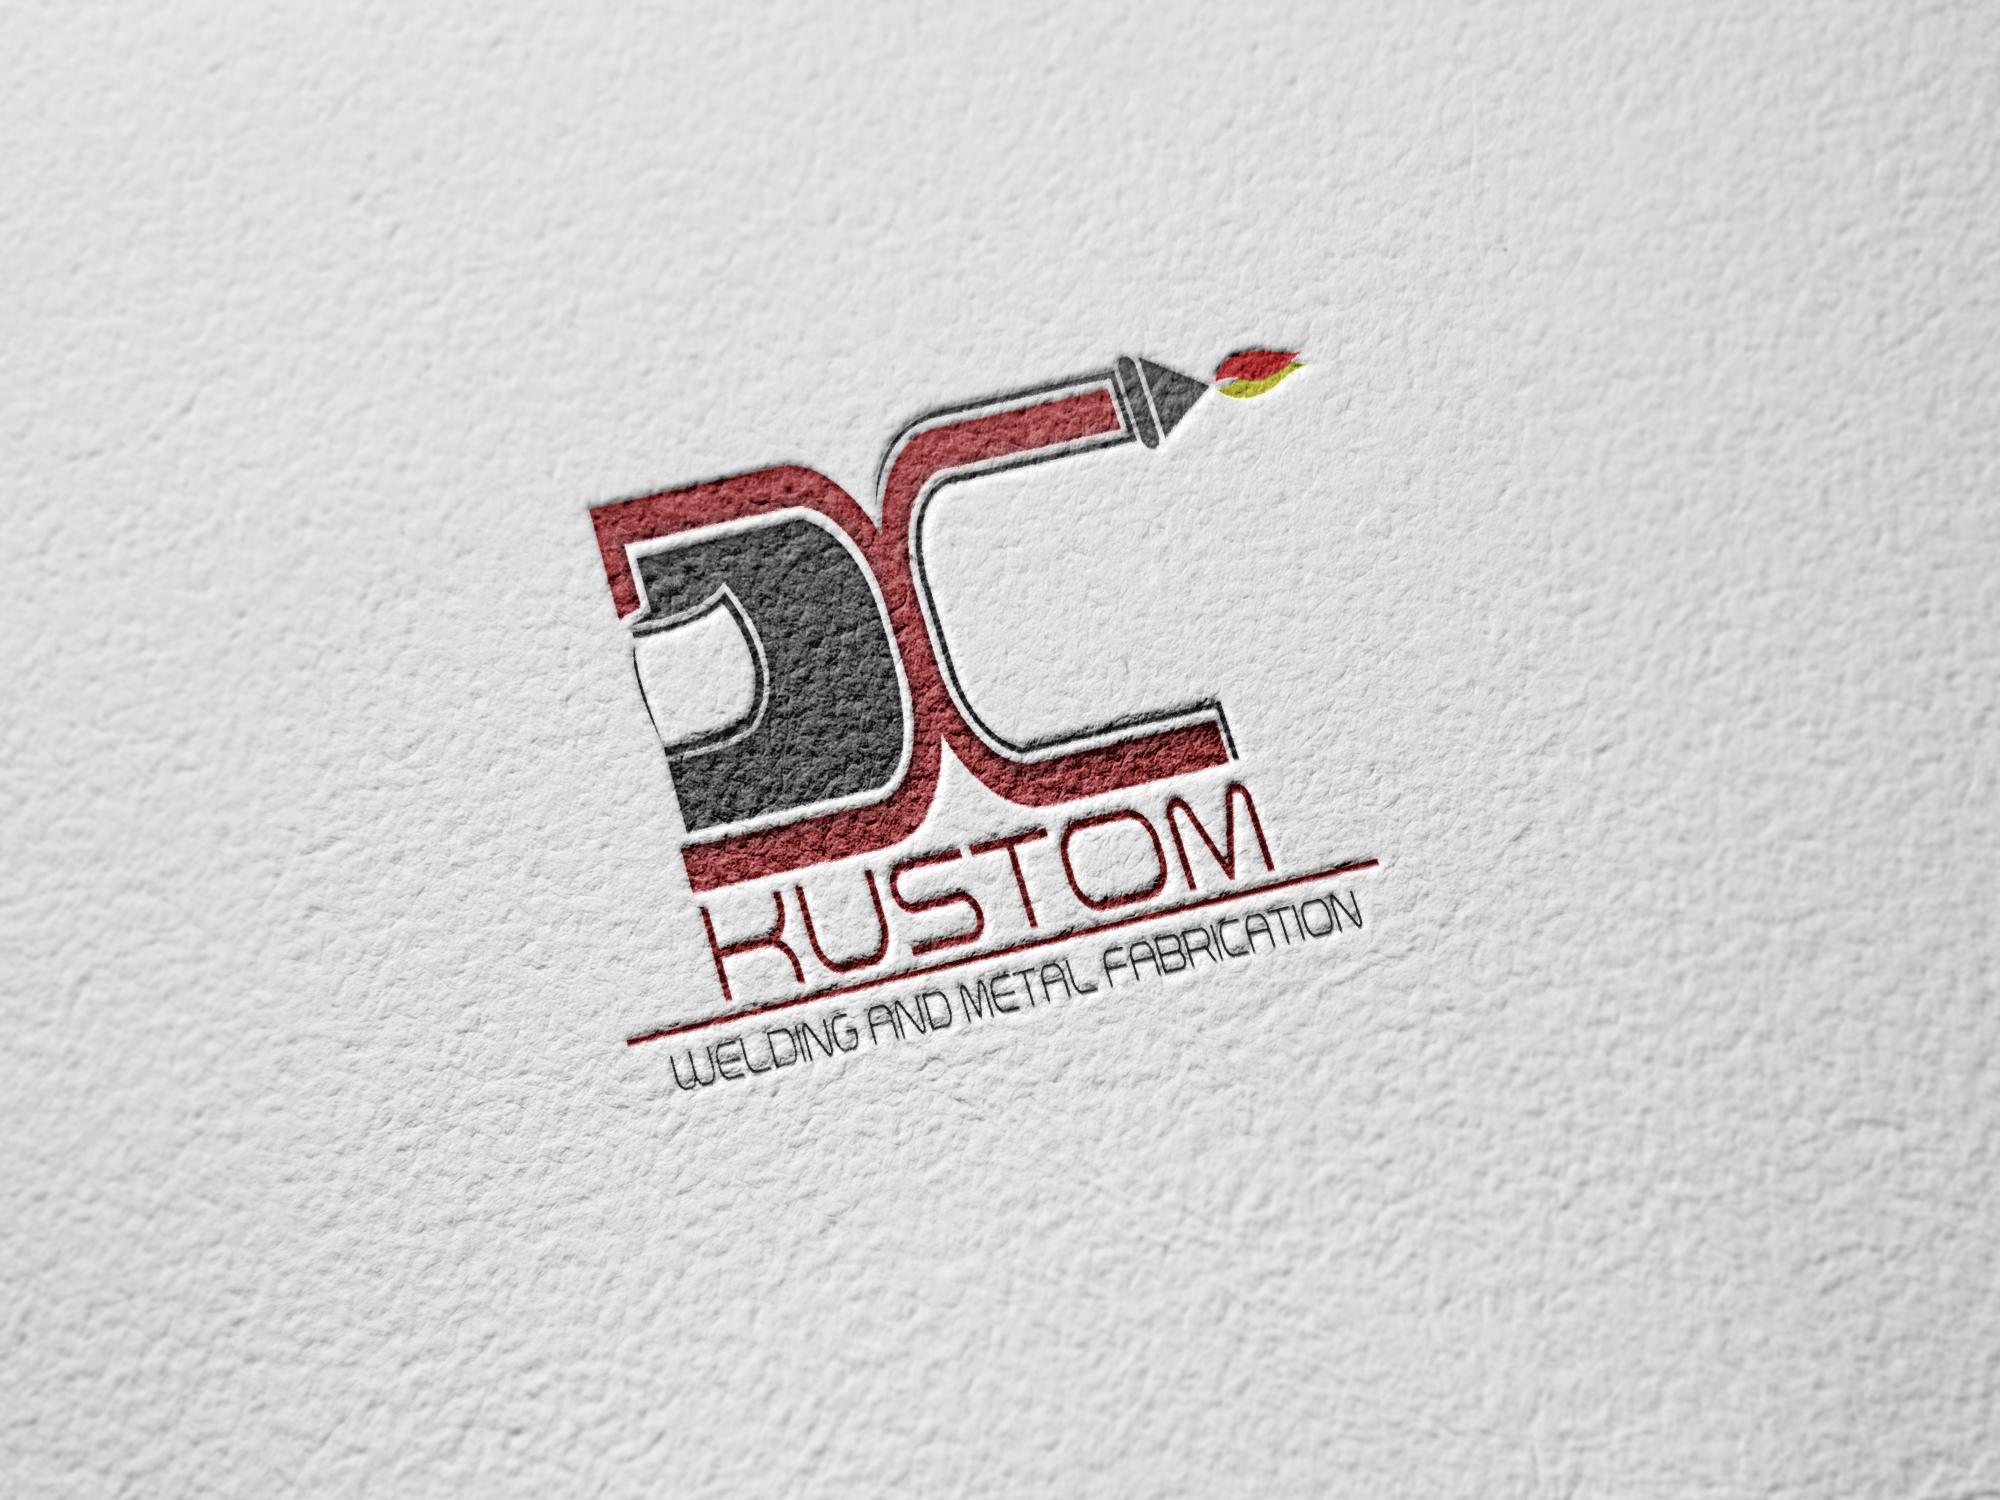 Logo Design by John Melvie Sulla - Entry No. 22 in the Logo Design Contest Imaginative Logo Design for DC KUSTOM WELDING & METAL FABRICATION.